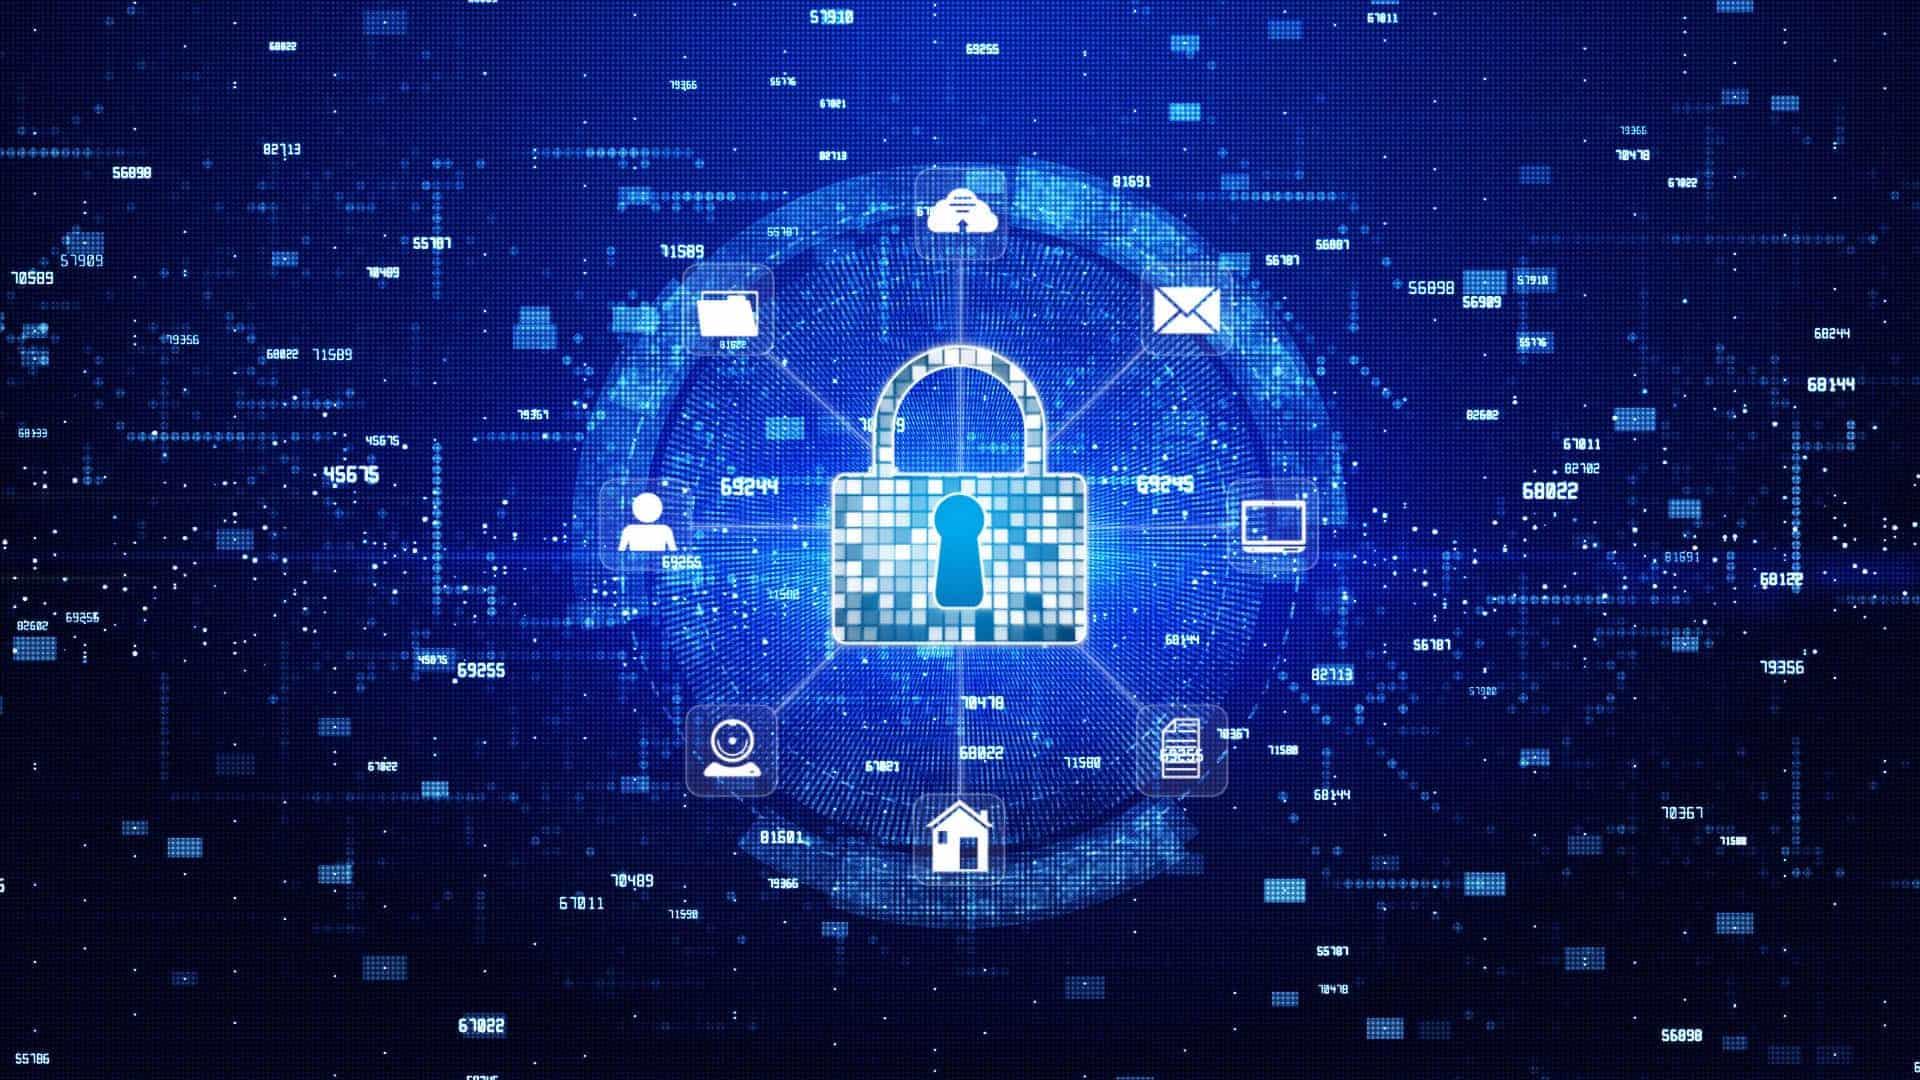 Seguridad blockchain inhackeable